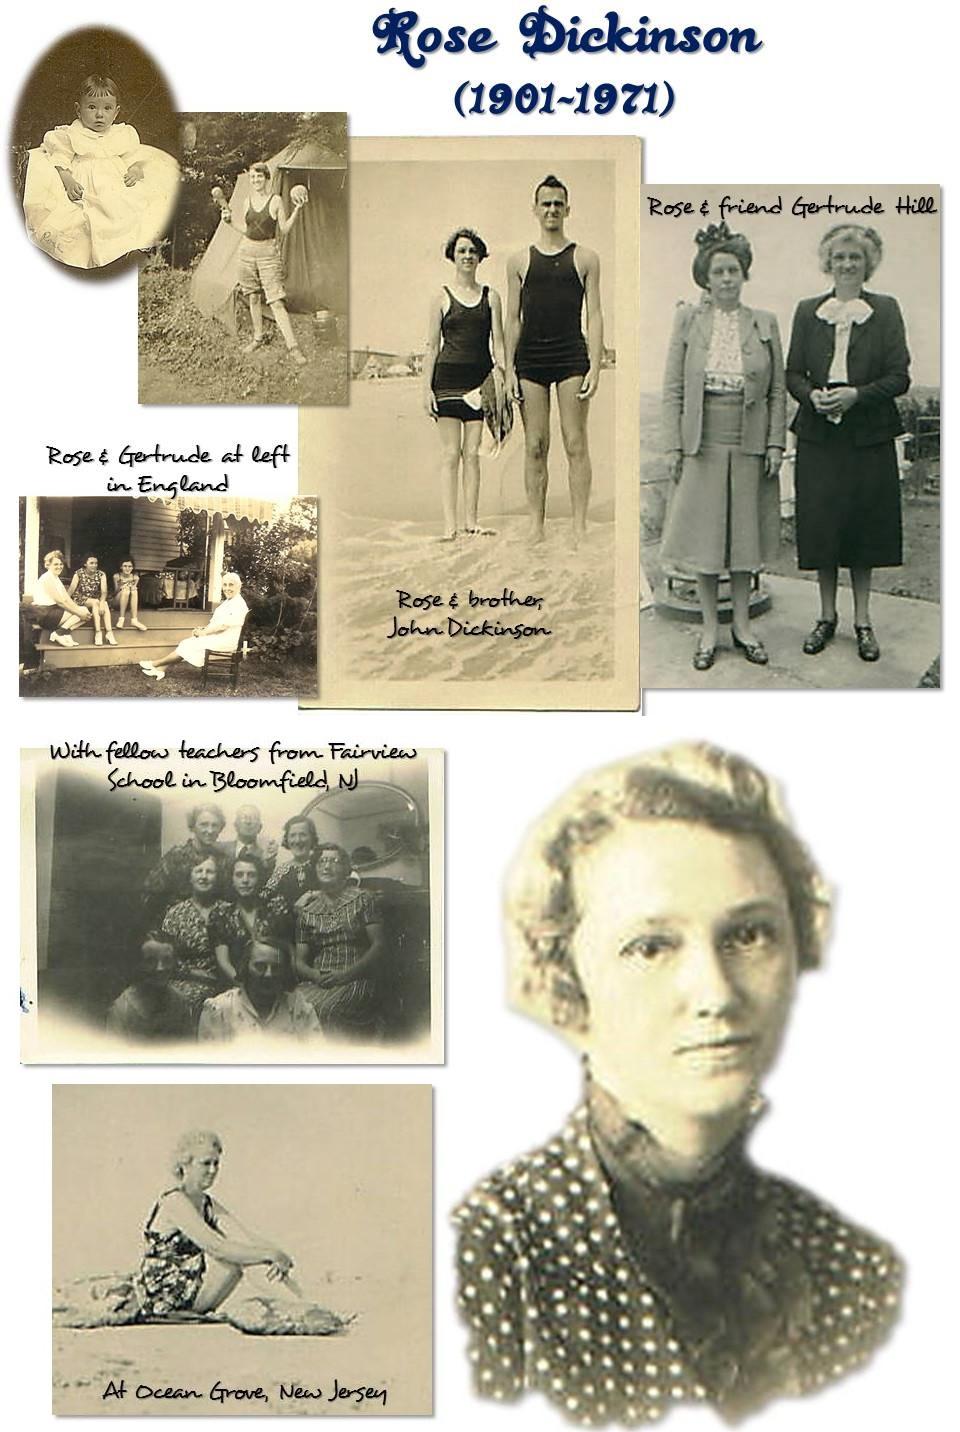 Rose Dickinson (1901-1970)